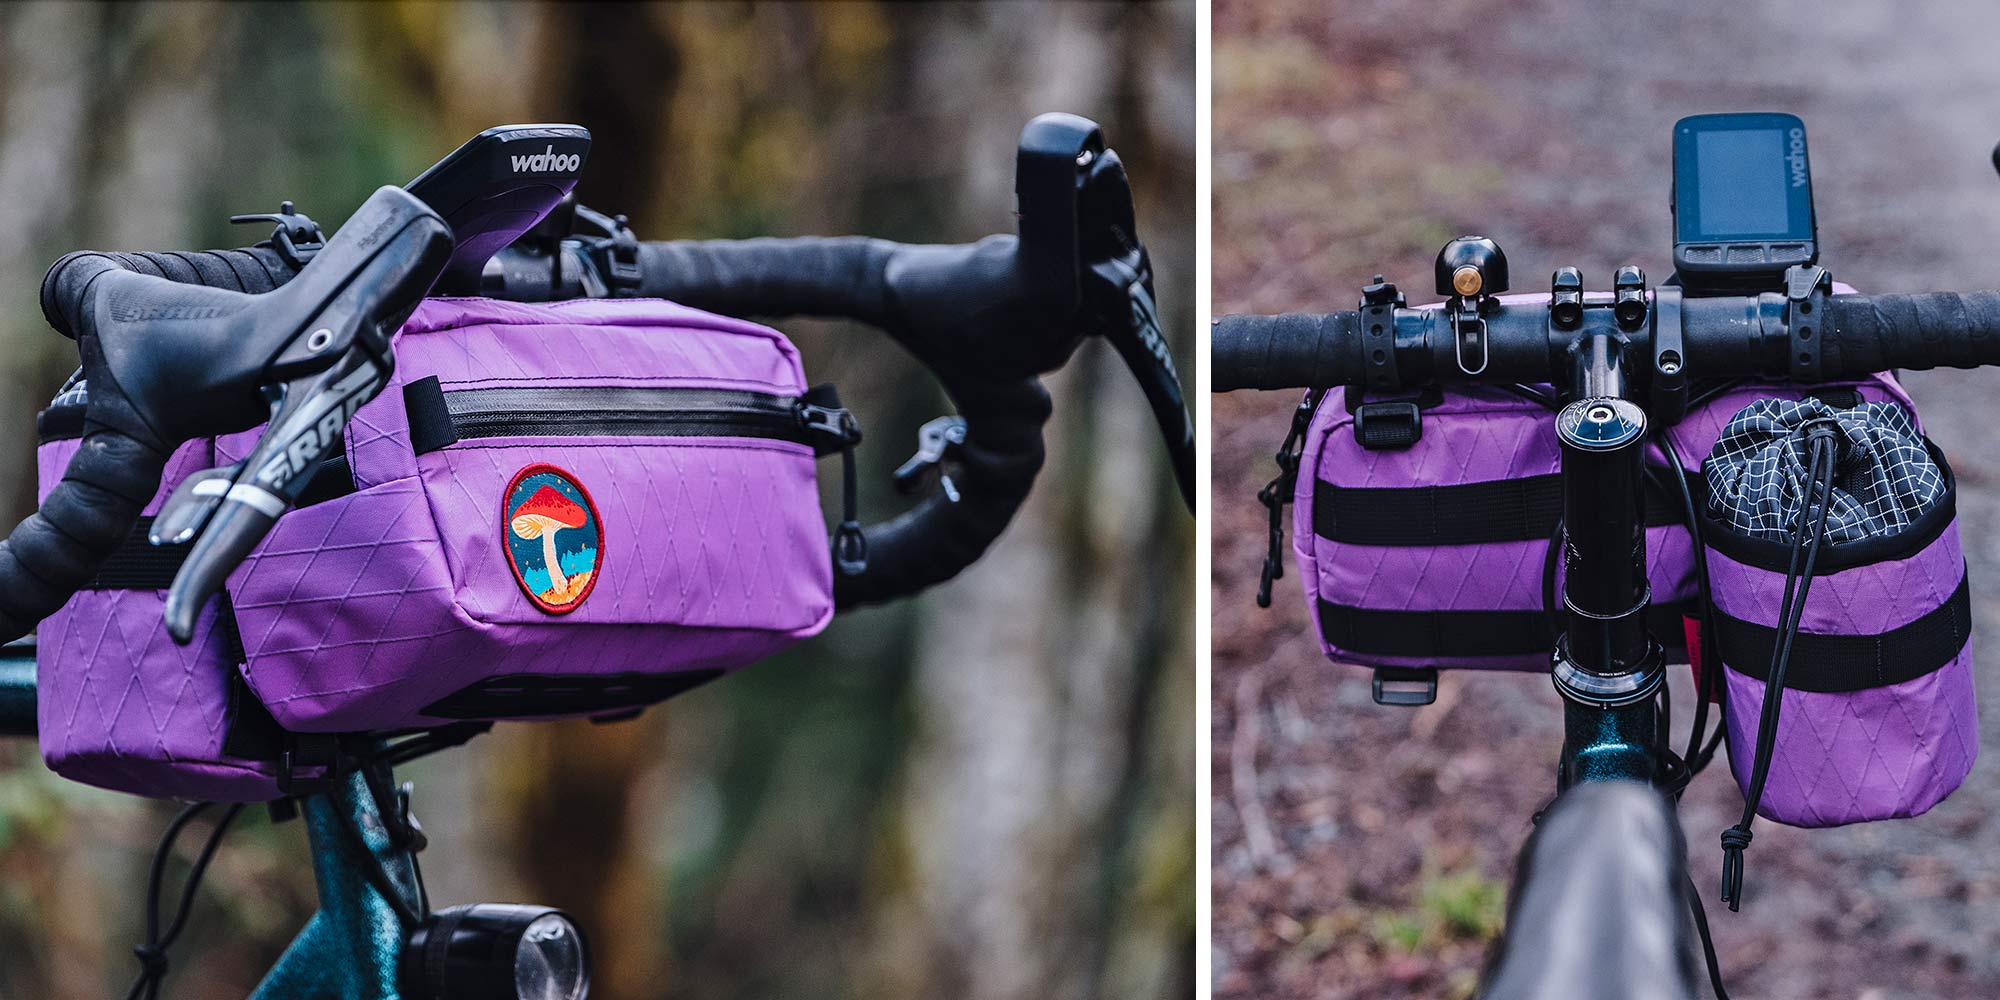 Swift Campout Kestrel bar bag & Sidekick in matching purple